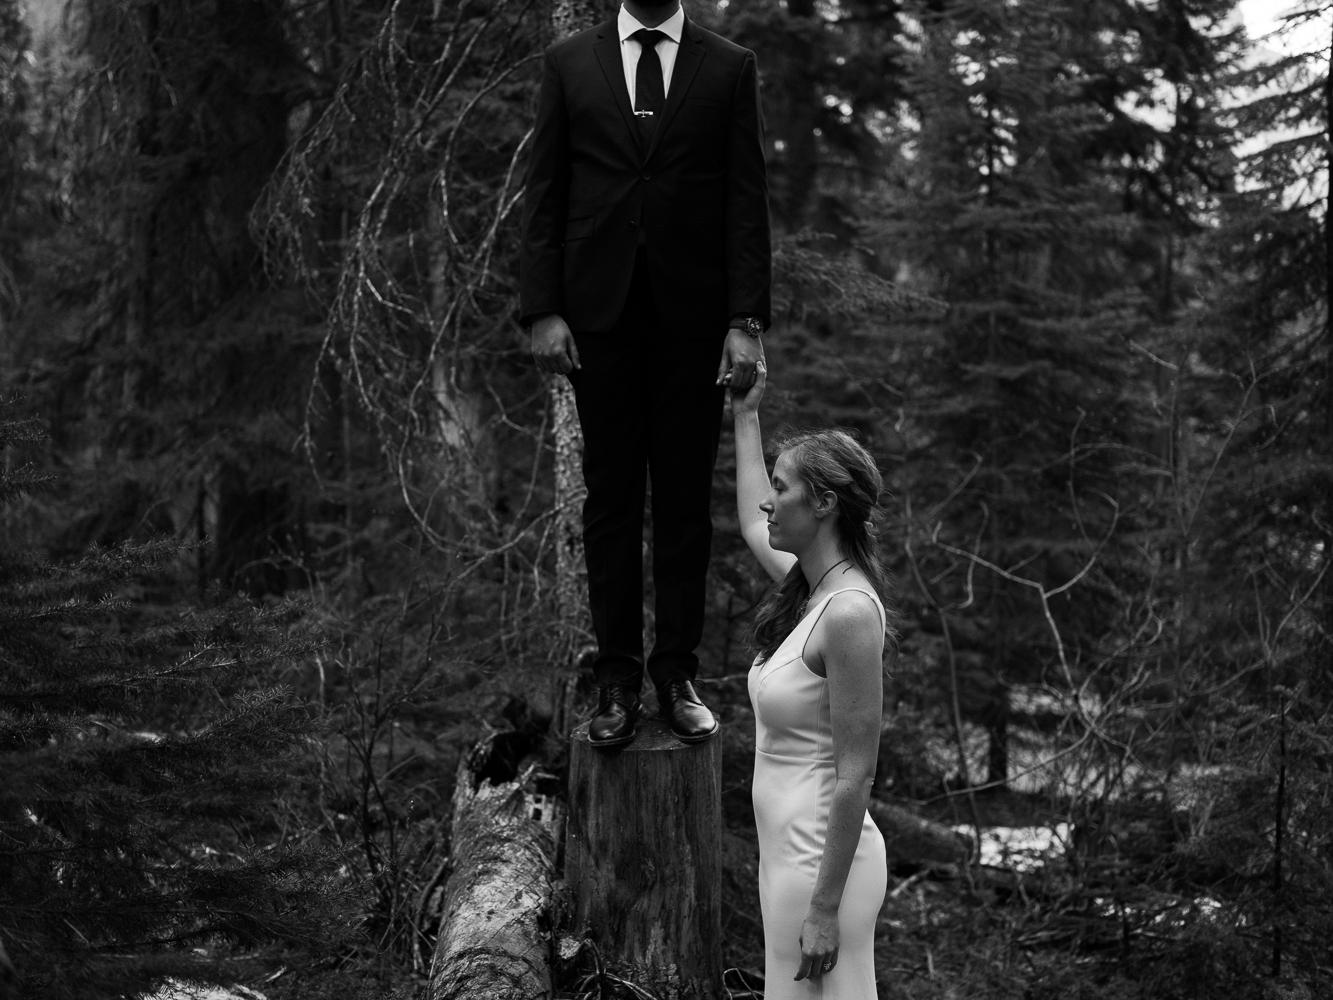 Capri-Wedding-Photographer-44.jpg